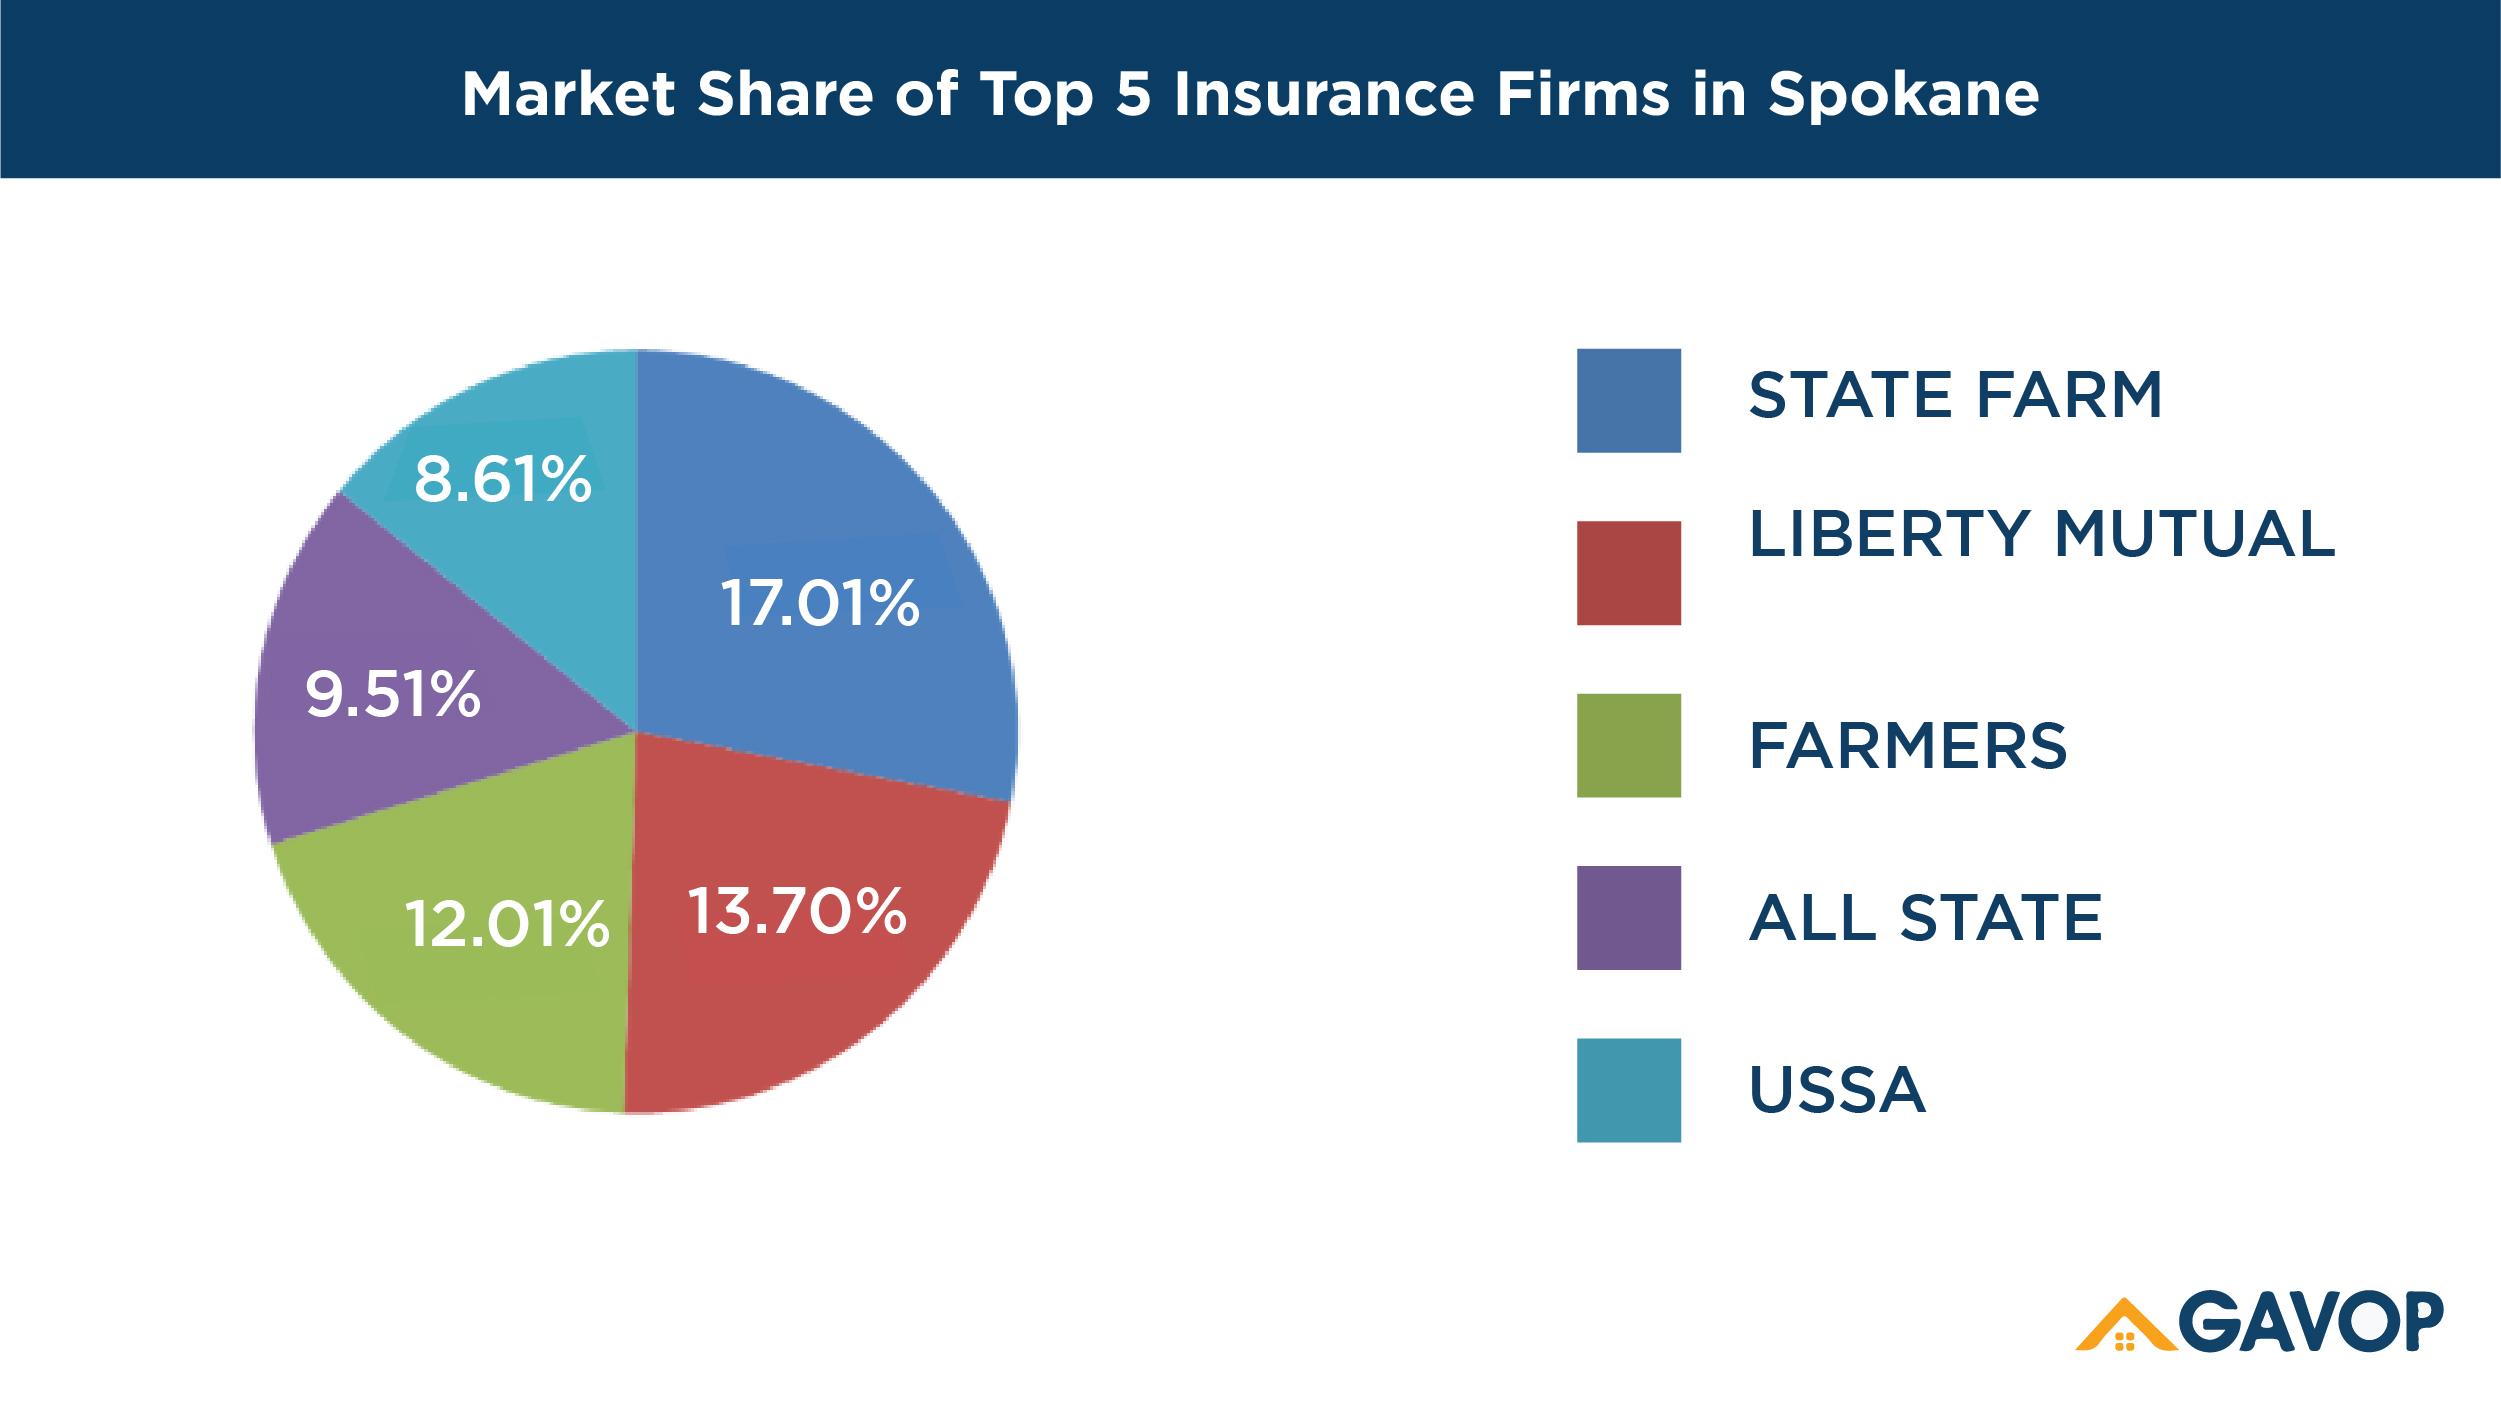 Top 5 Homeowners Insurance companies in Spokane, Washington